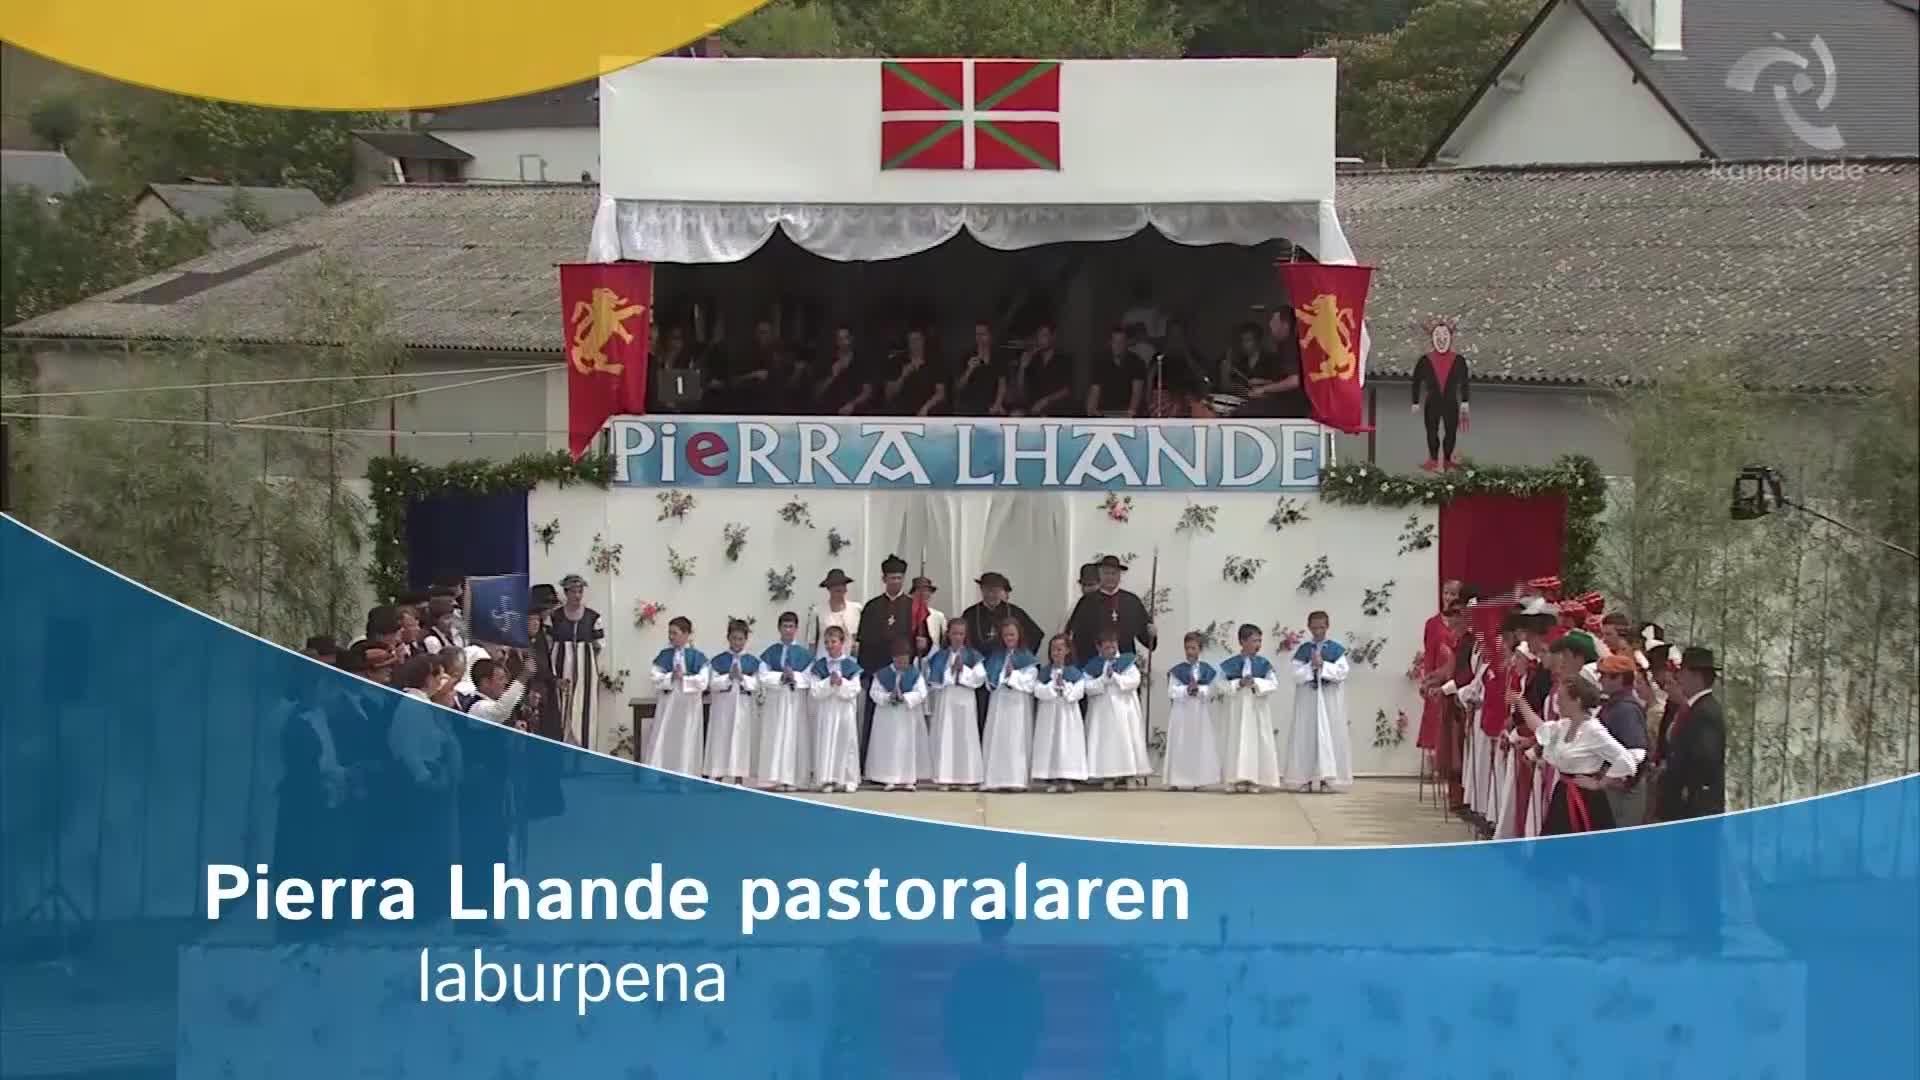 Pierra Lhande pastoralaren DVDa salgai da